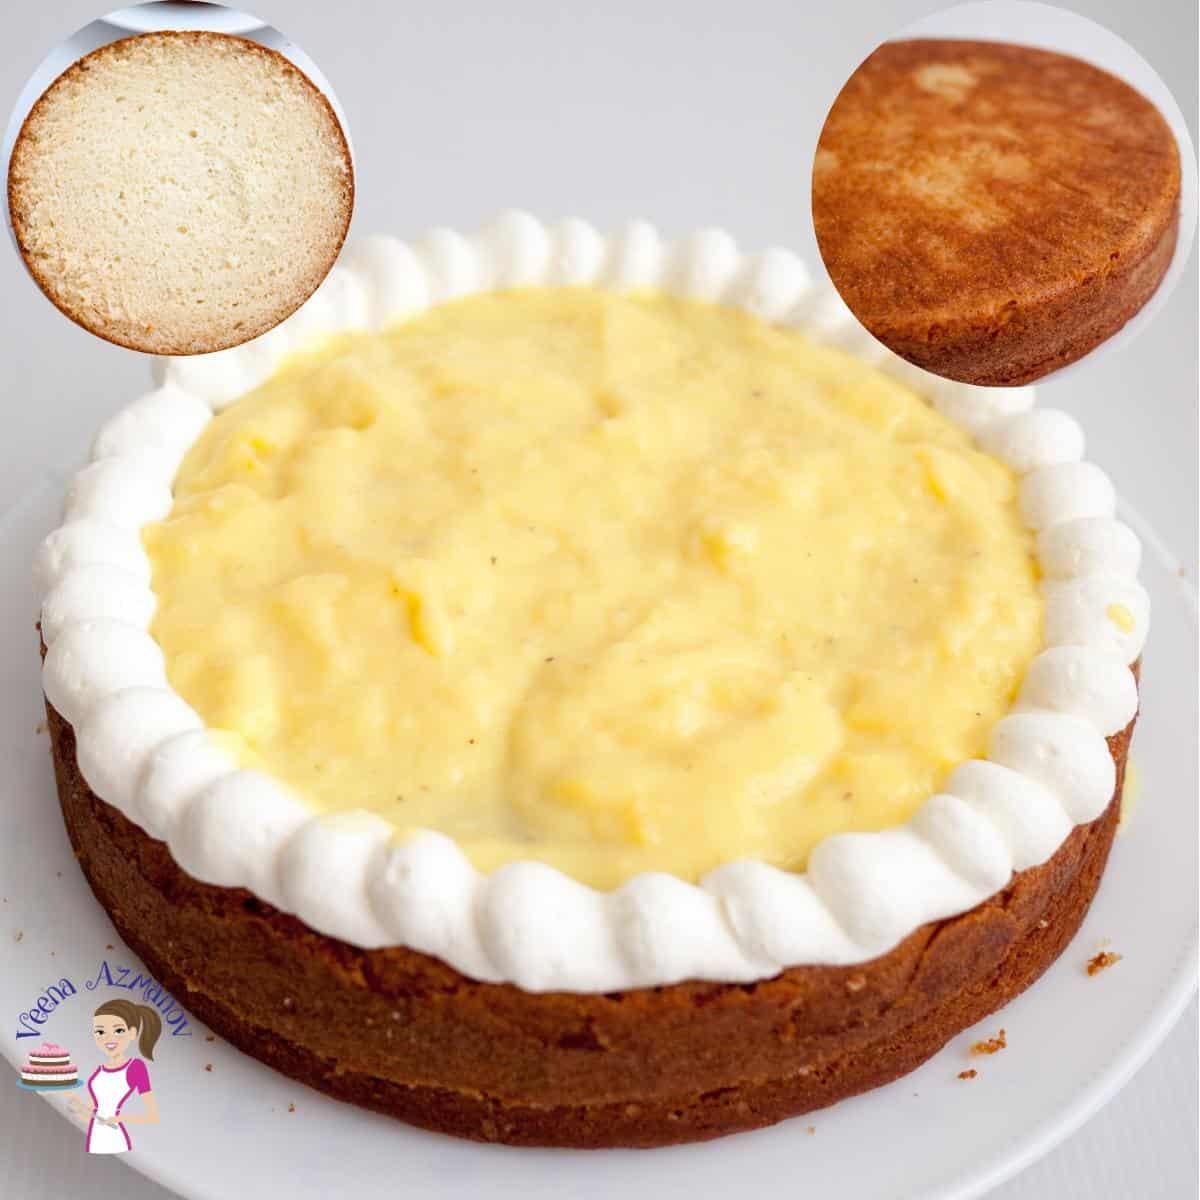 Homemade Cake Recipe Vanilla Flavour and Eggless